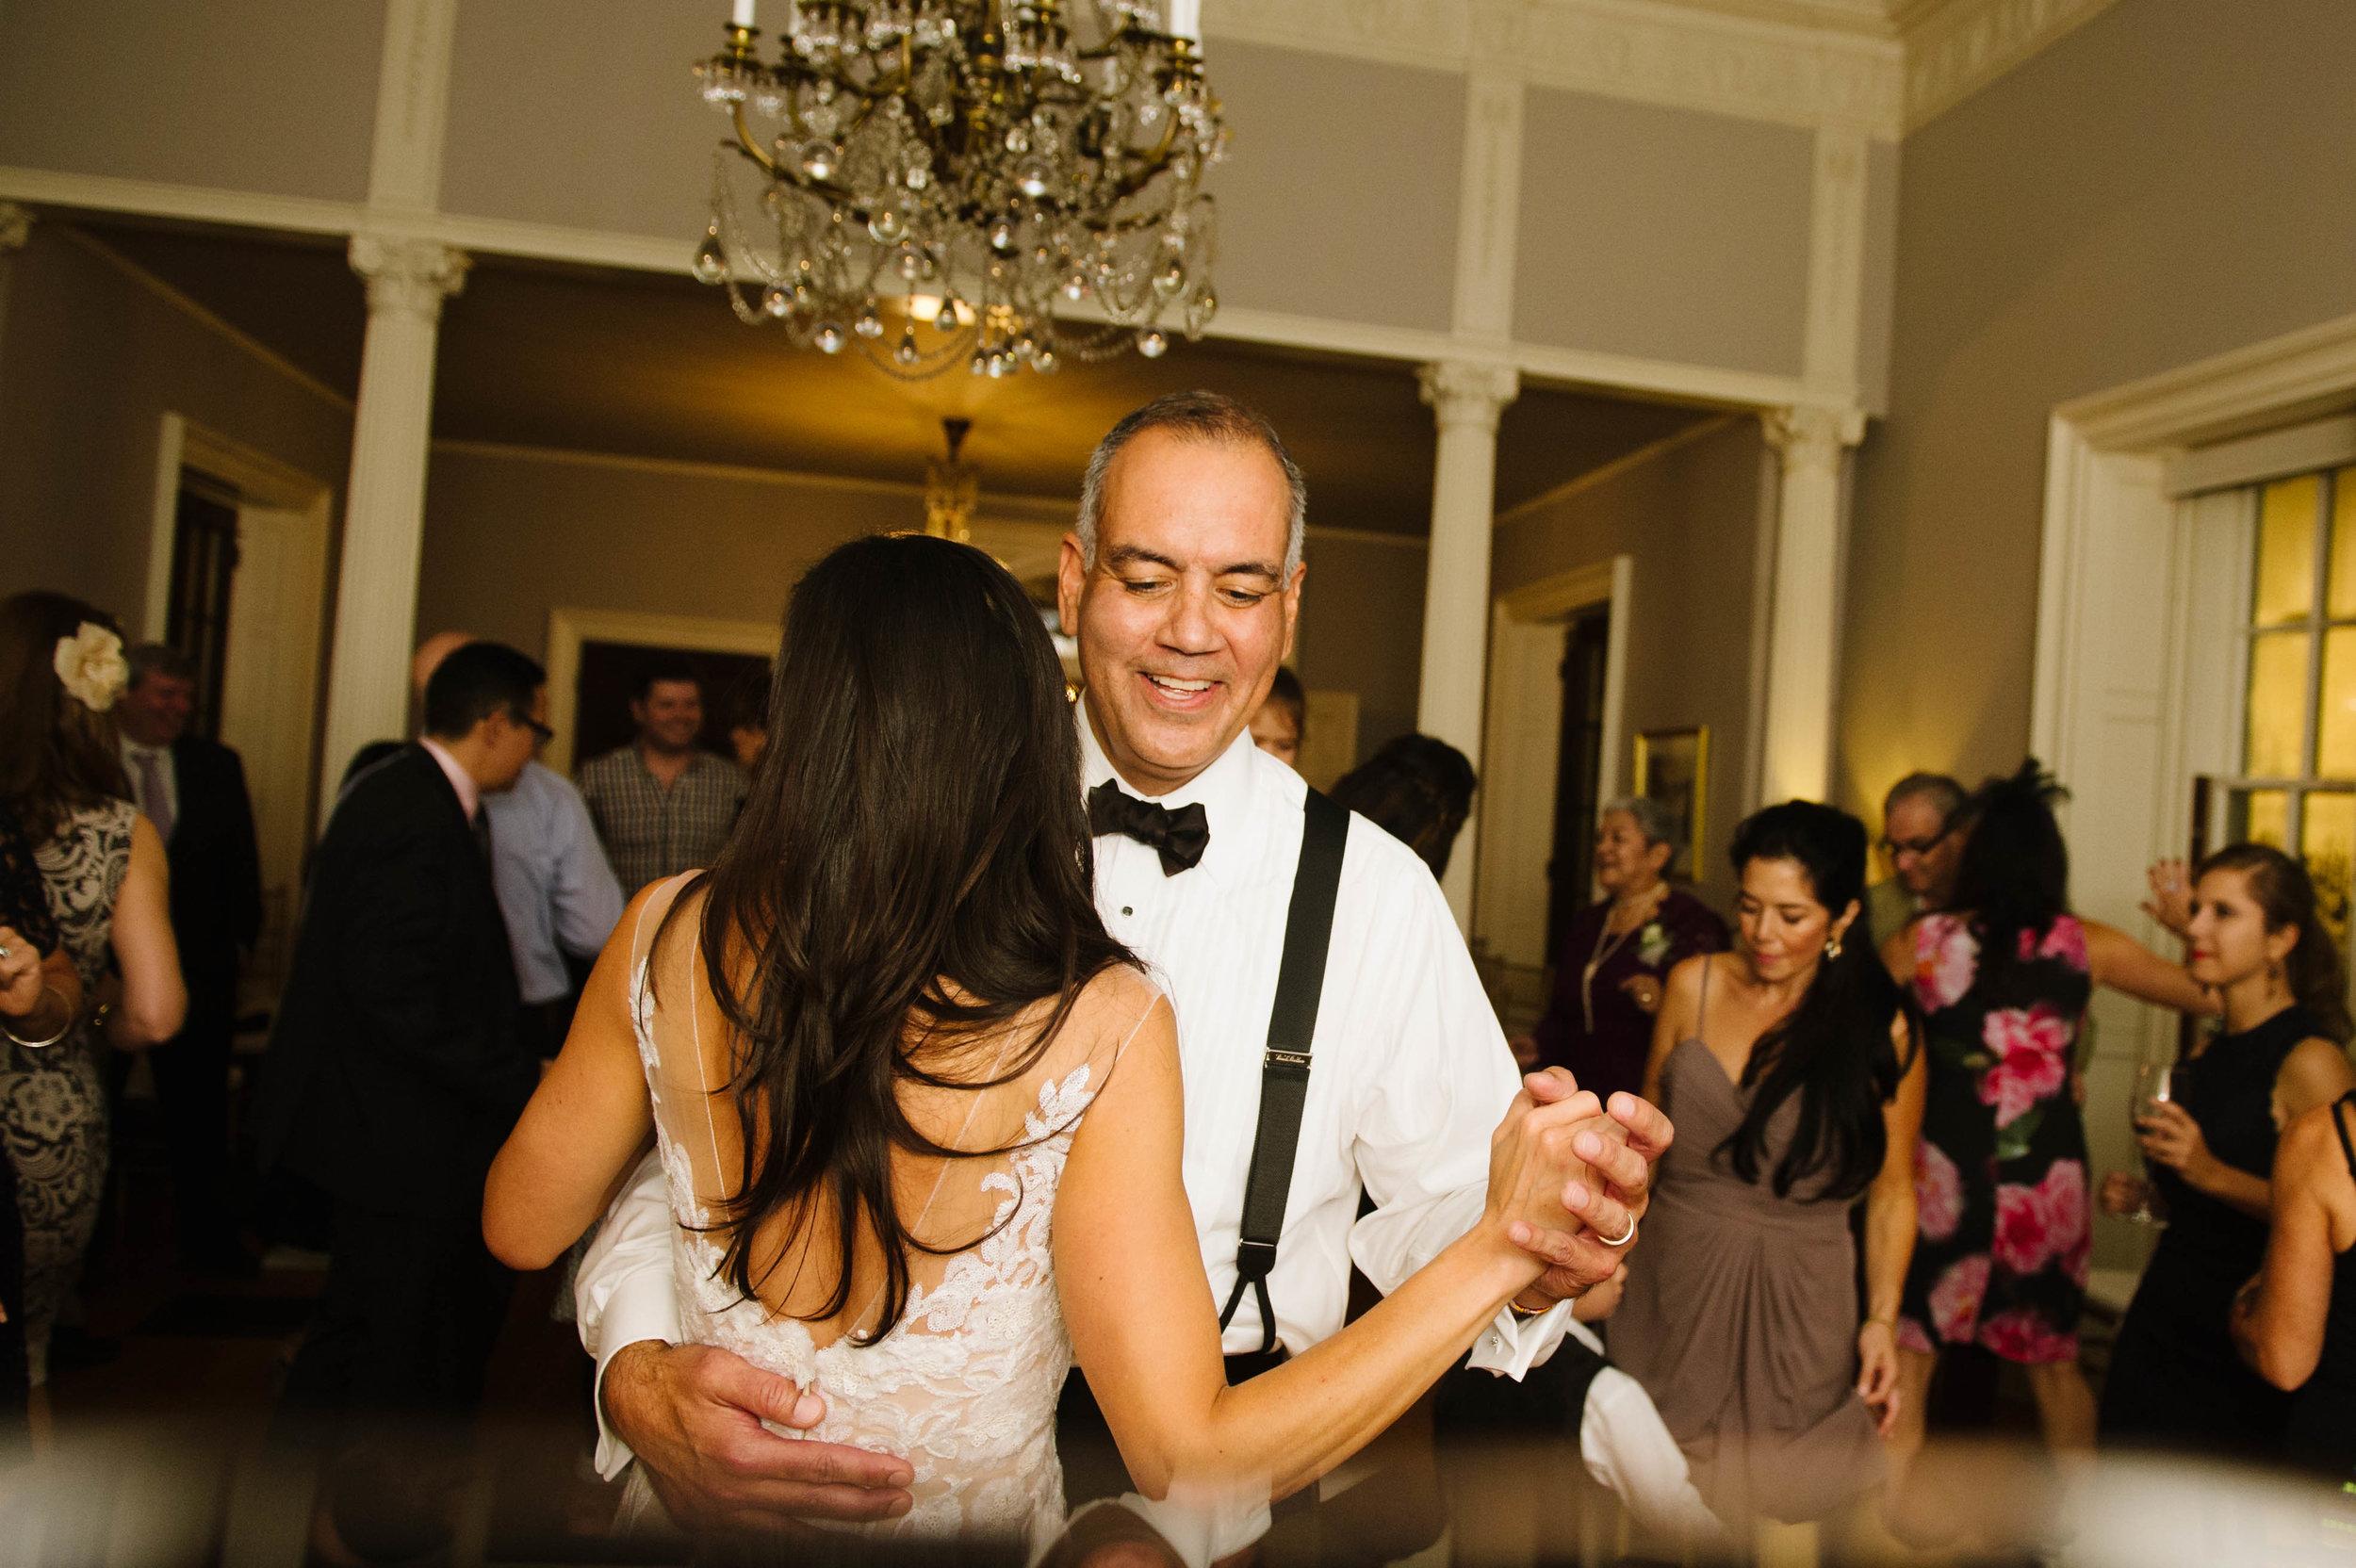 Candid-Wedding-Photography-Boston17.jpg